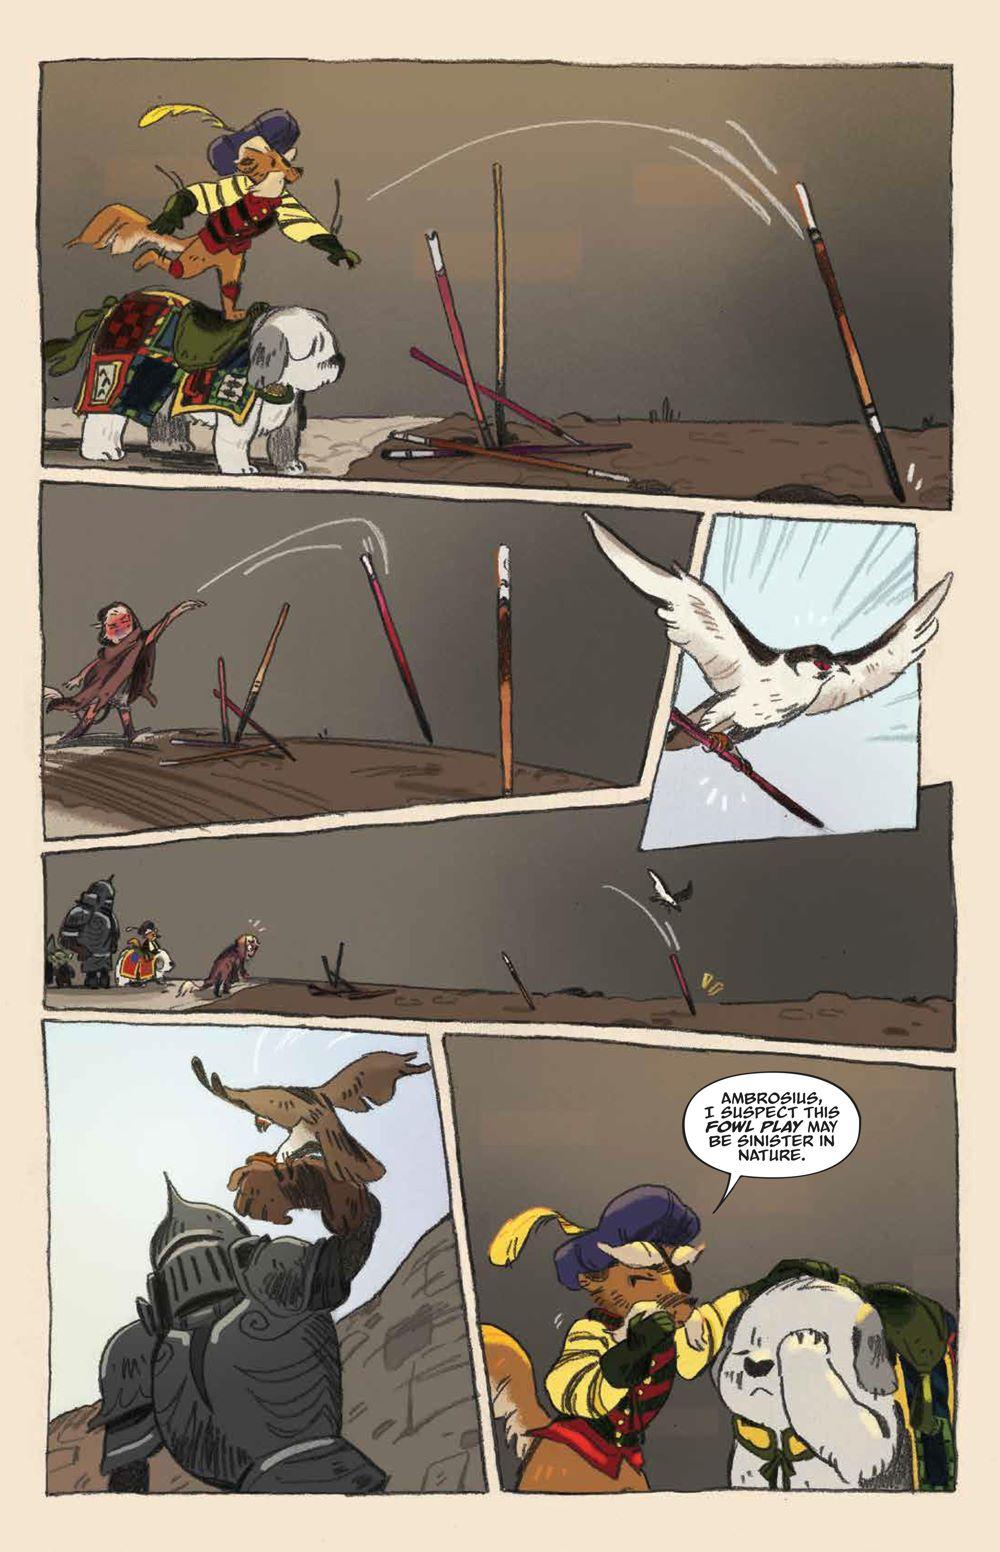 Labyrinth_UnderSpell_HC_PRESS_22 ComicList Previews: JIM HENSON'S LABYRINTH UNDER THE SPELL HC